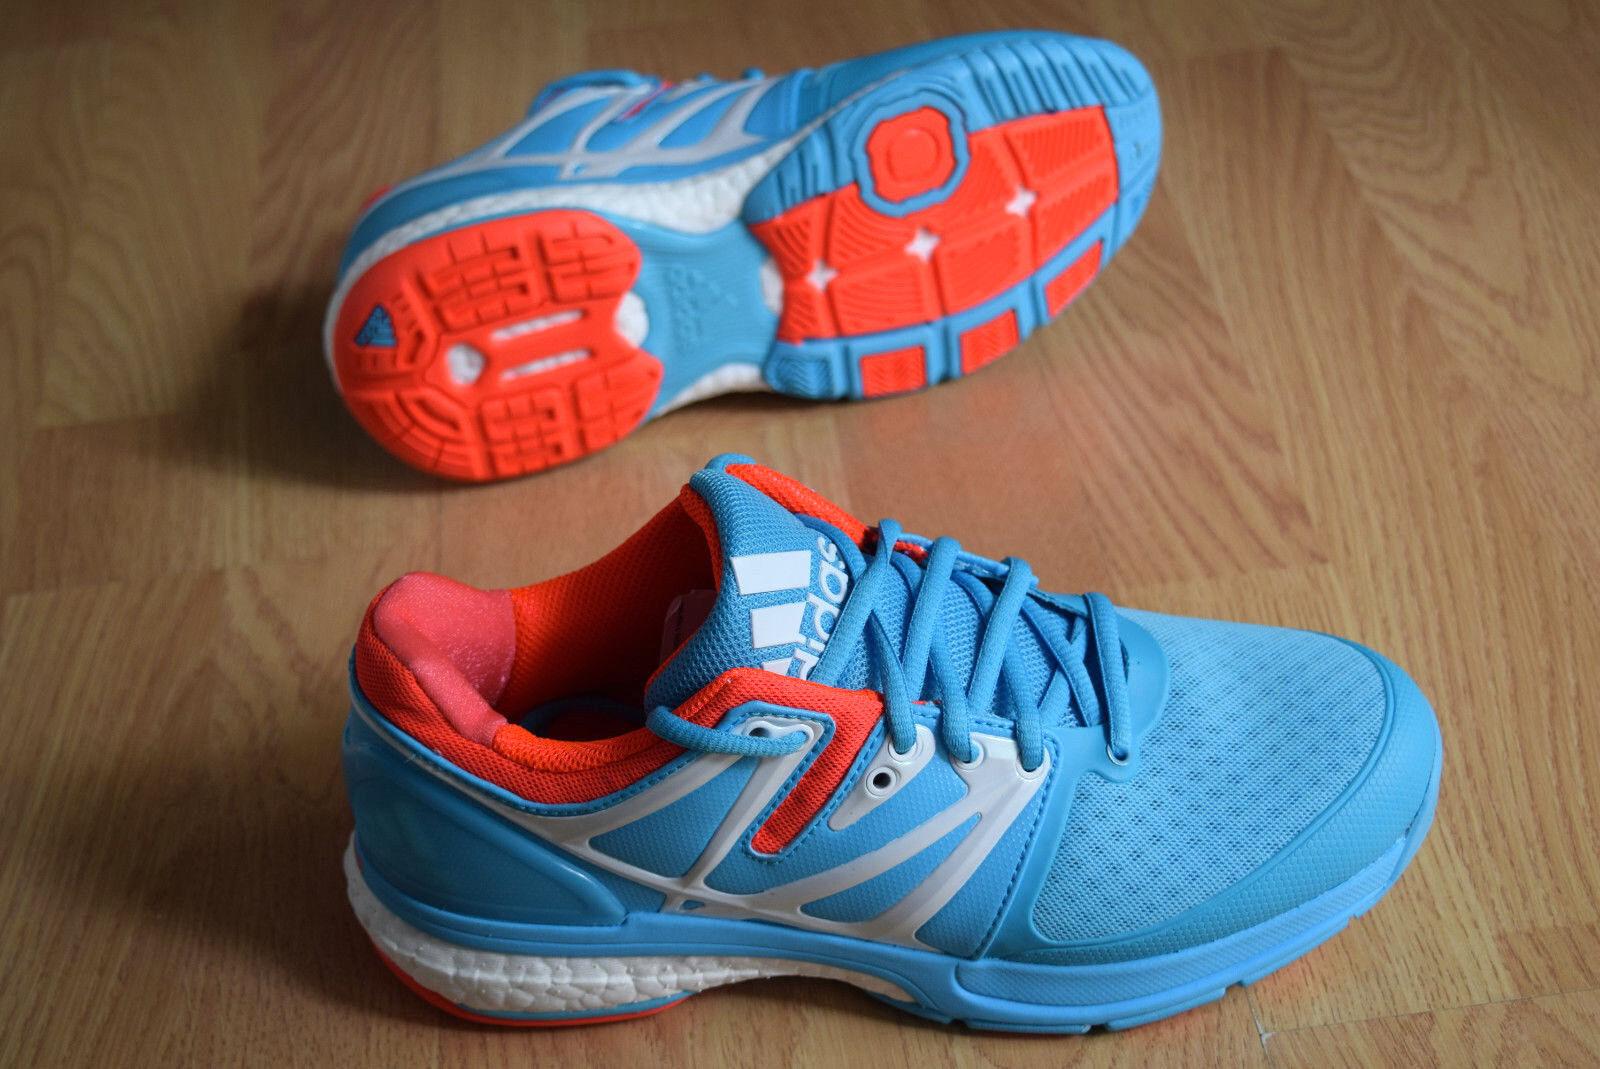 Adidas Stabil Boost W 37 38 38 5 39 Handballschuhe B27238 adipower handball